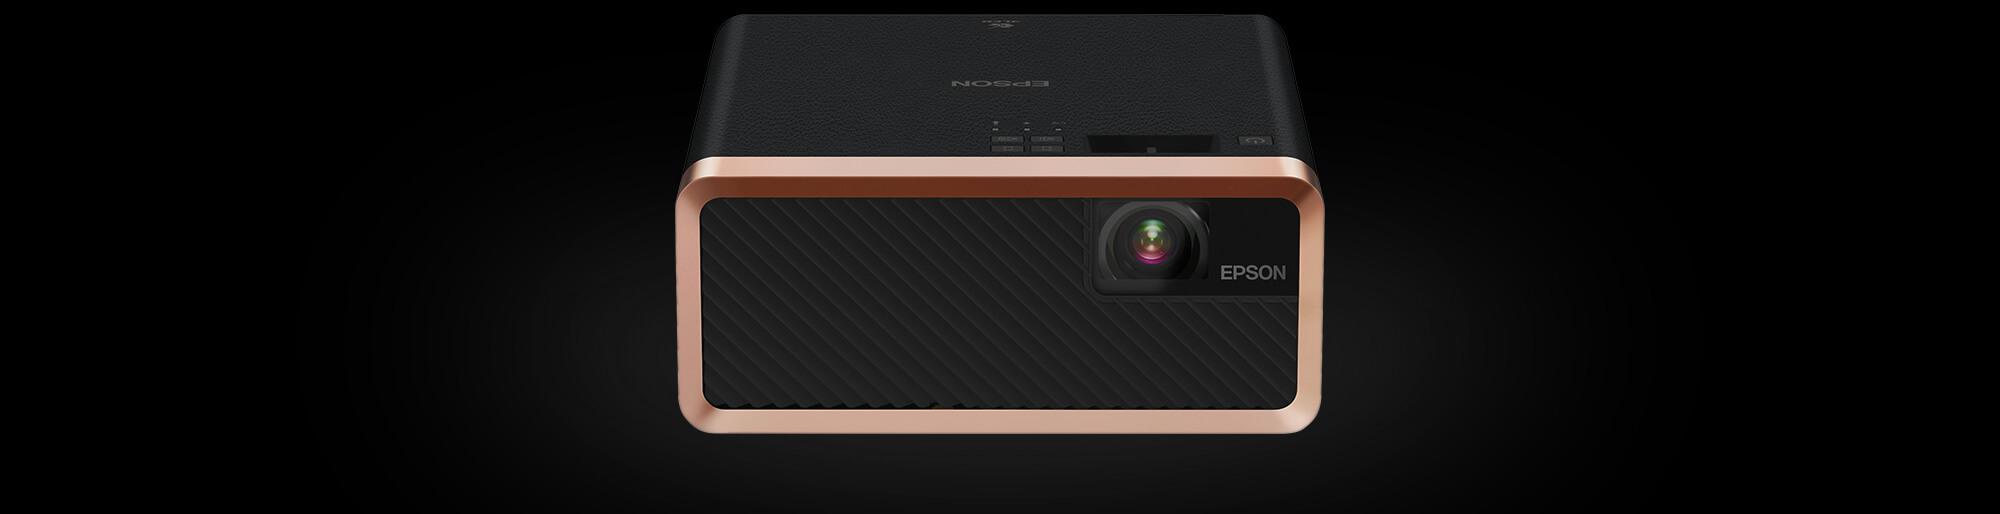 Epson EB-100B Projector